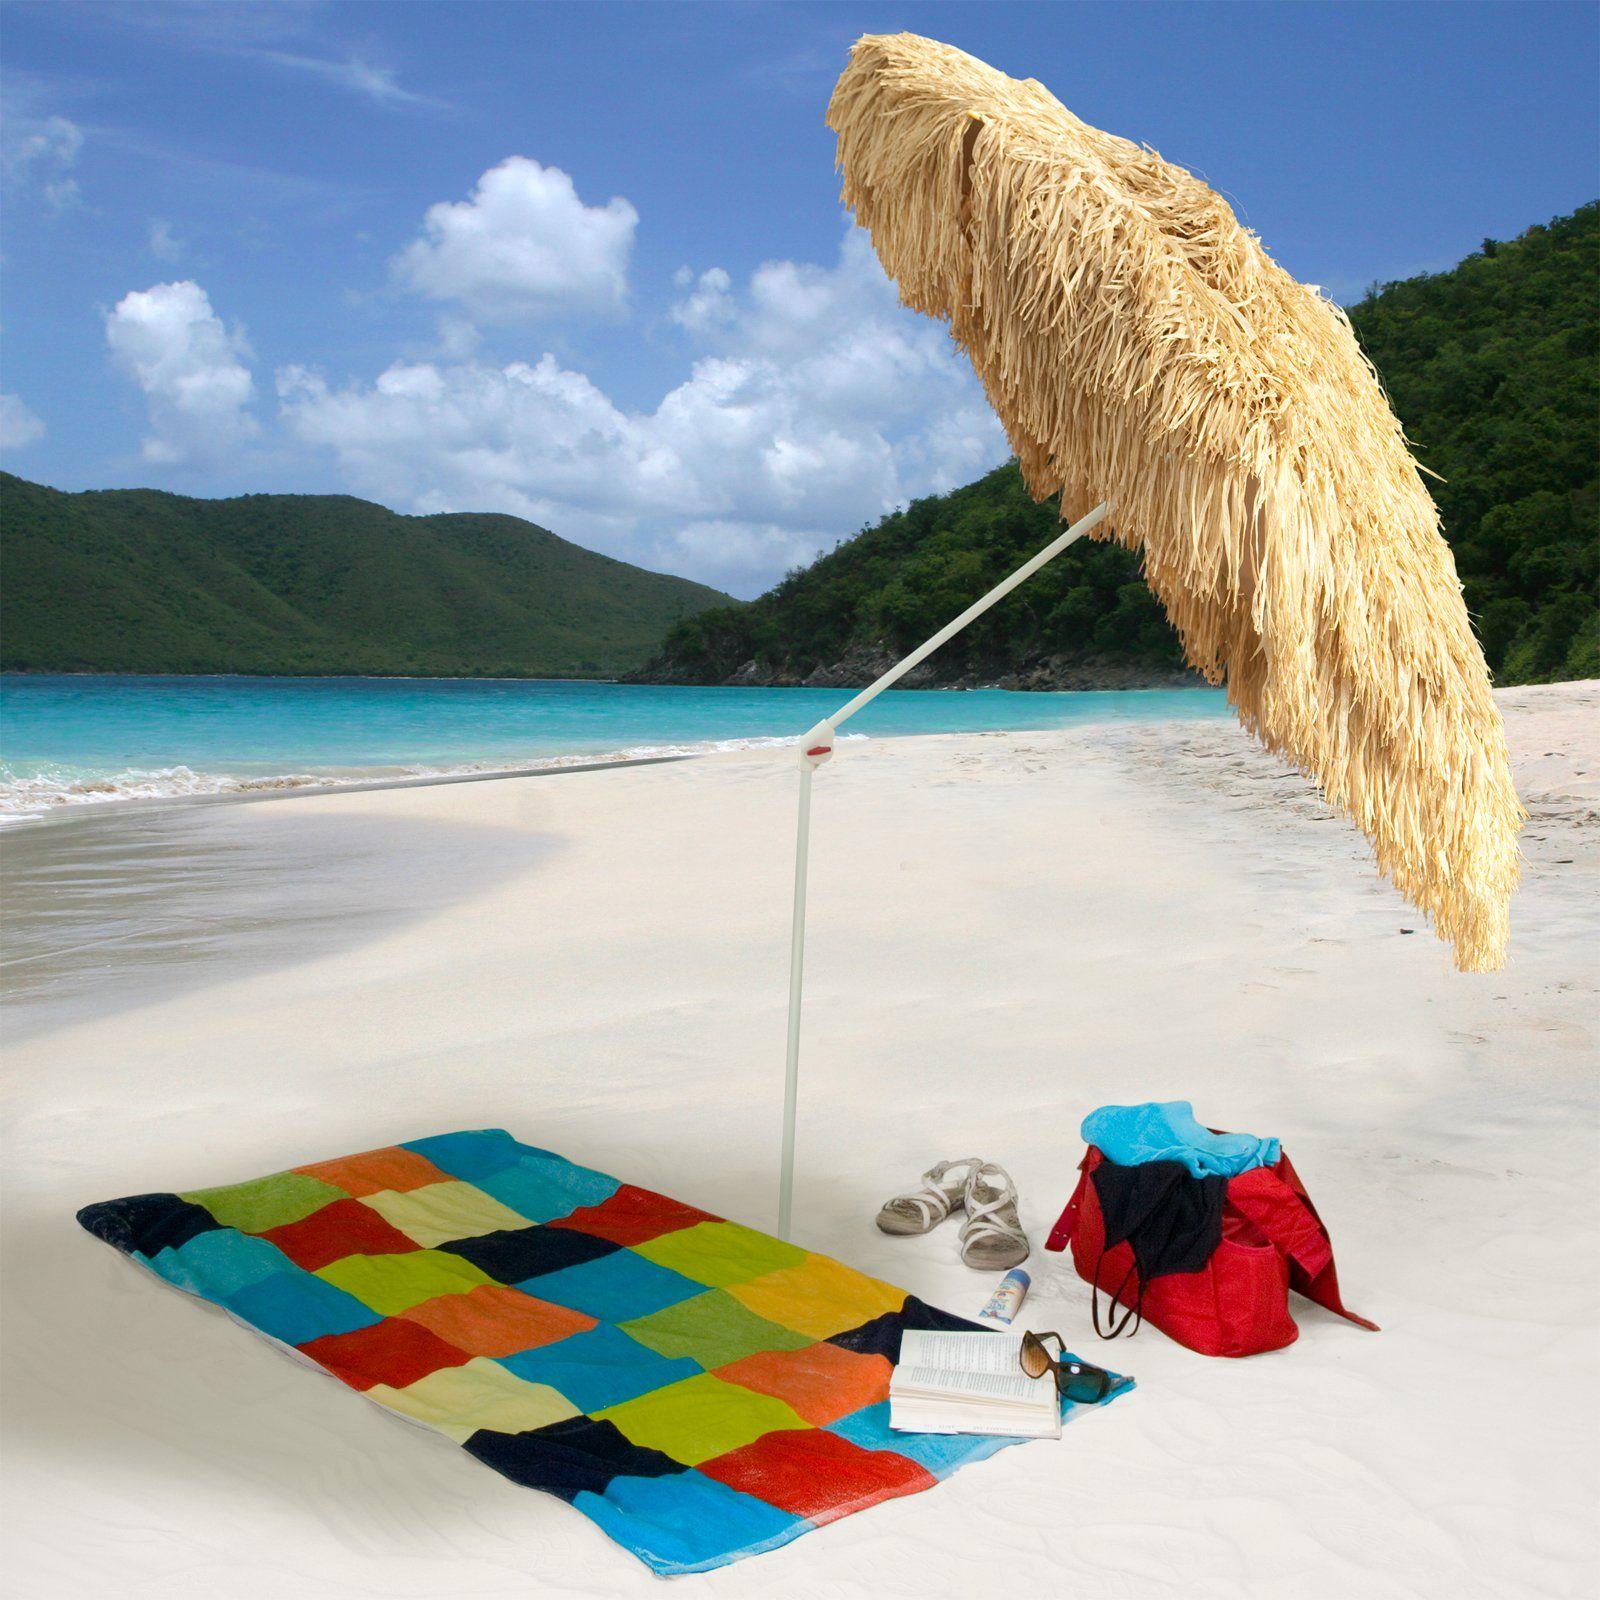 Parasol 6 ft. Palapa Beach Umbrella - Whiskey